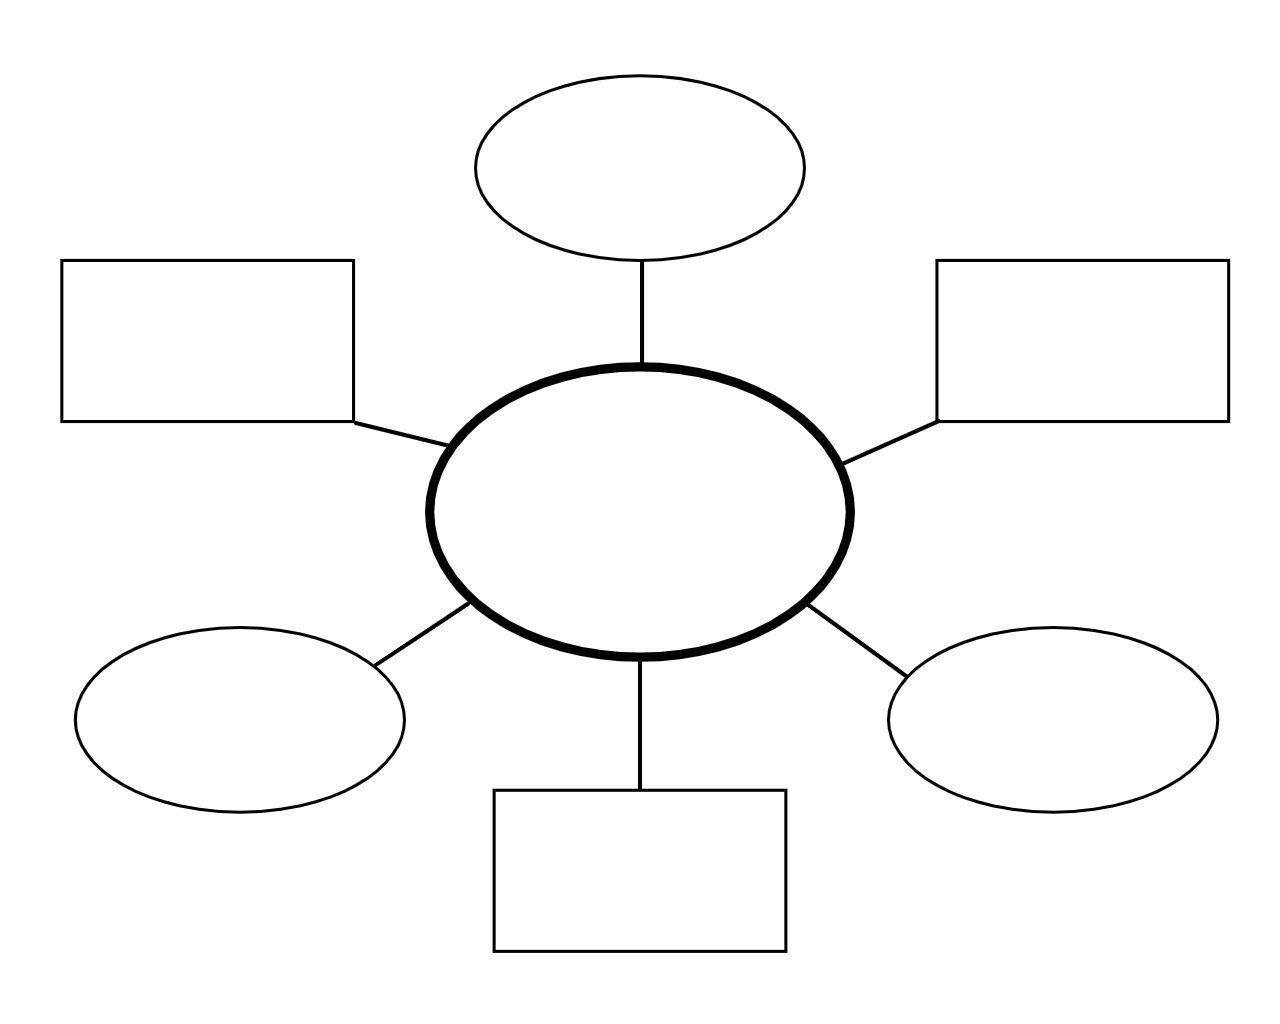 An example Brainstorm Chart template.